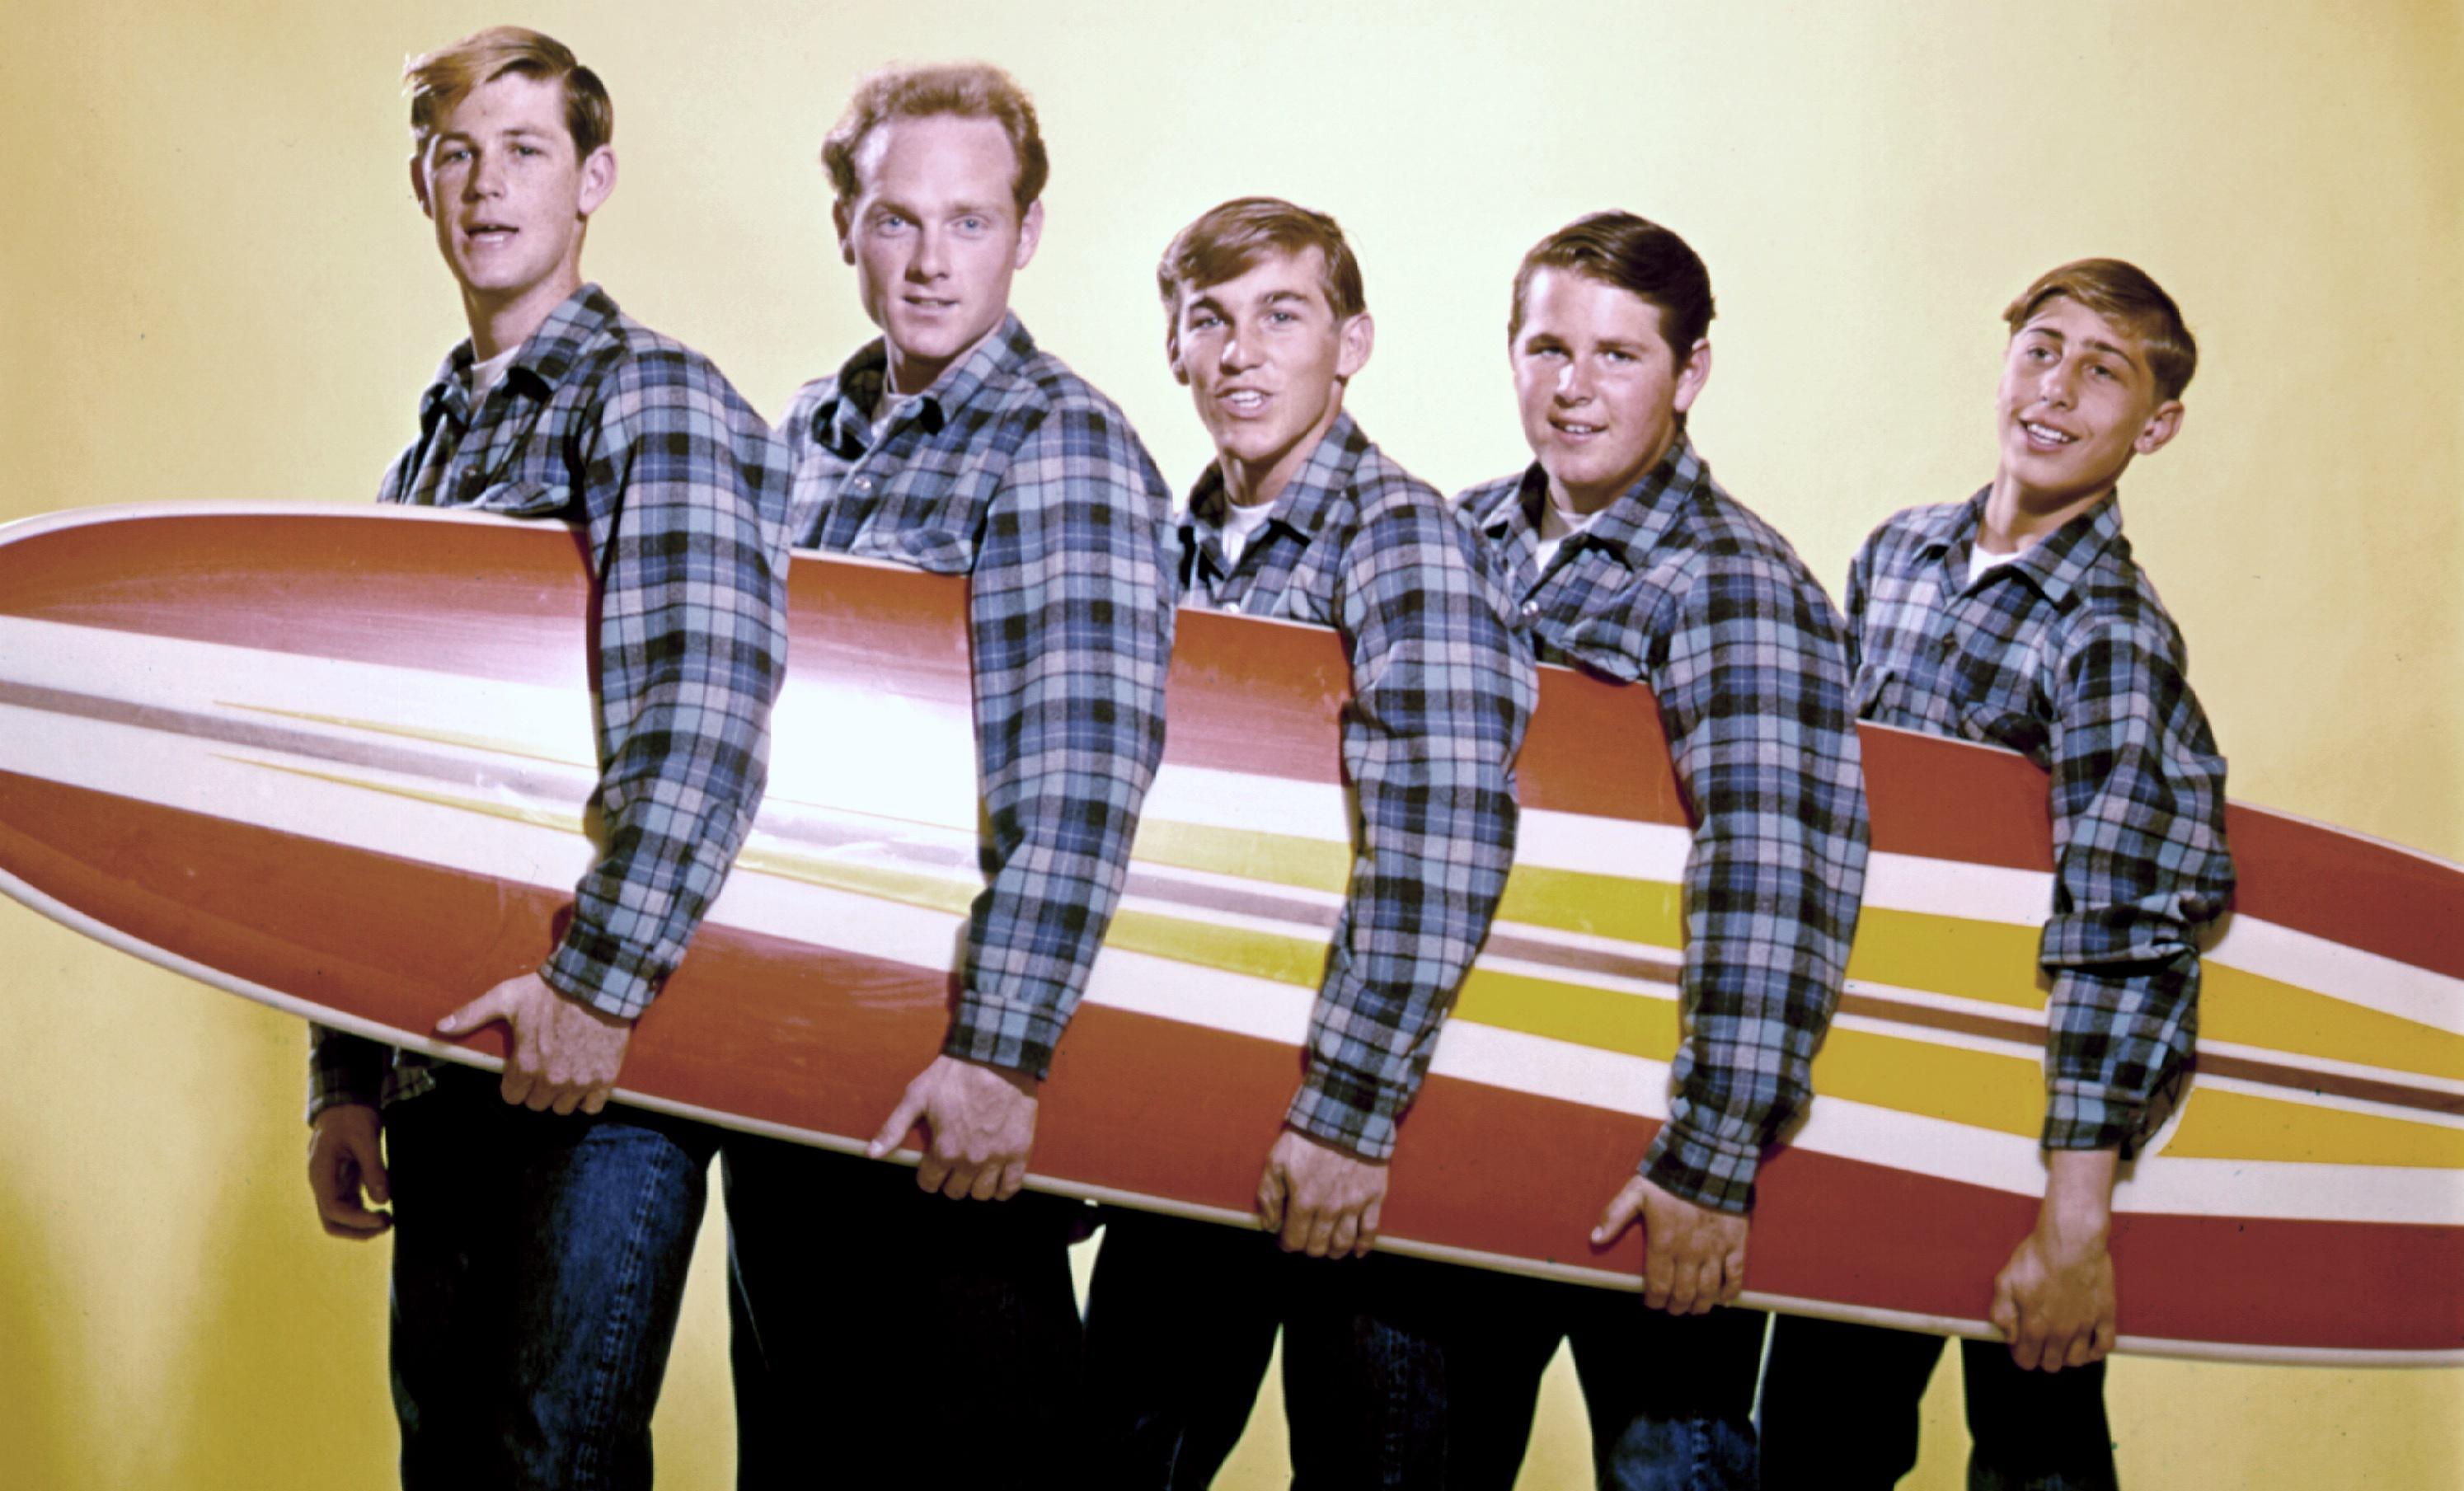 The Beach Boys Wallpapers Hd   Beach Boys   2989x1809 Wallpaper 2989x1809